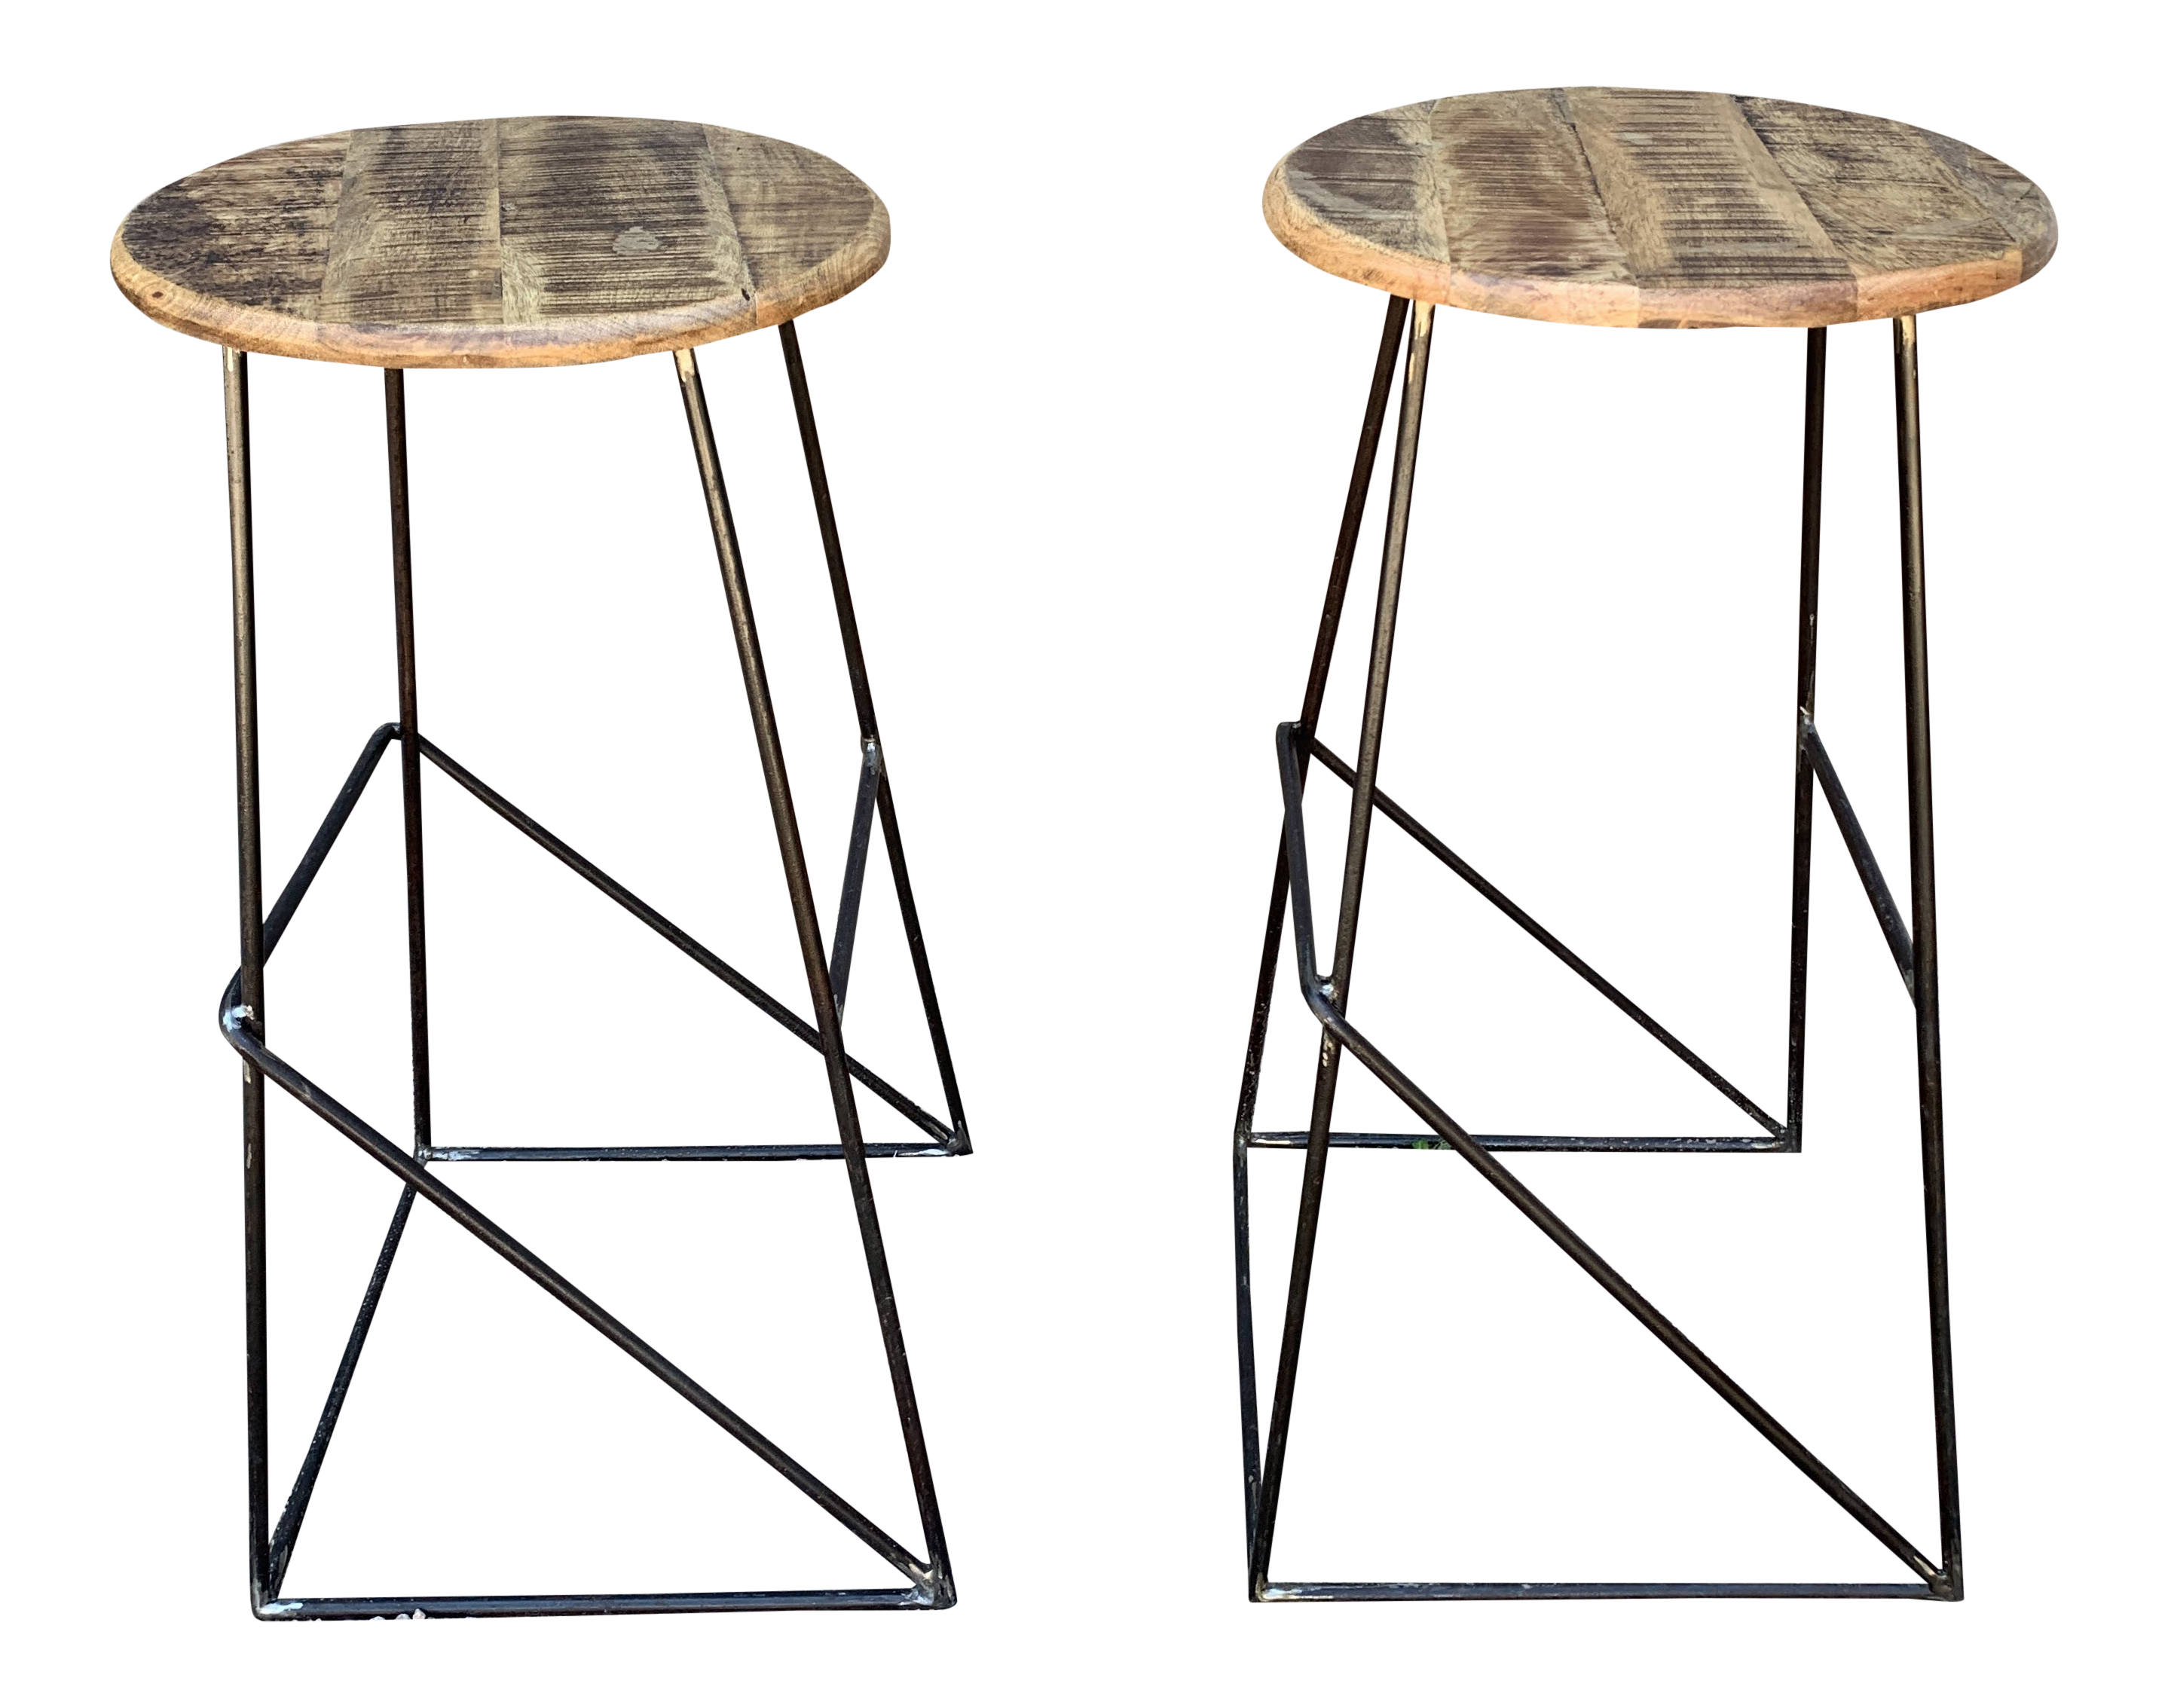 Modern Kalalou Rustic Wood And Metal Bar Stools A Pair Chairish